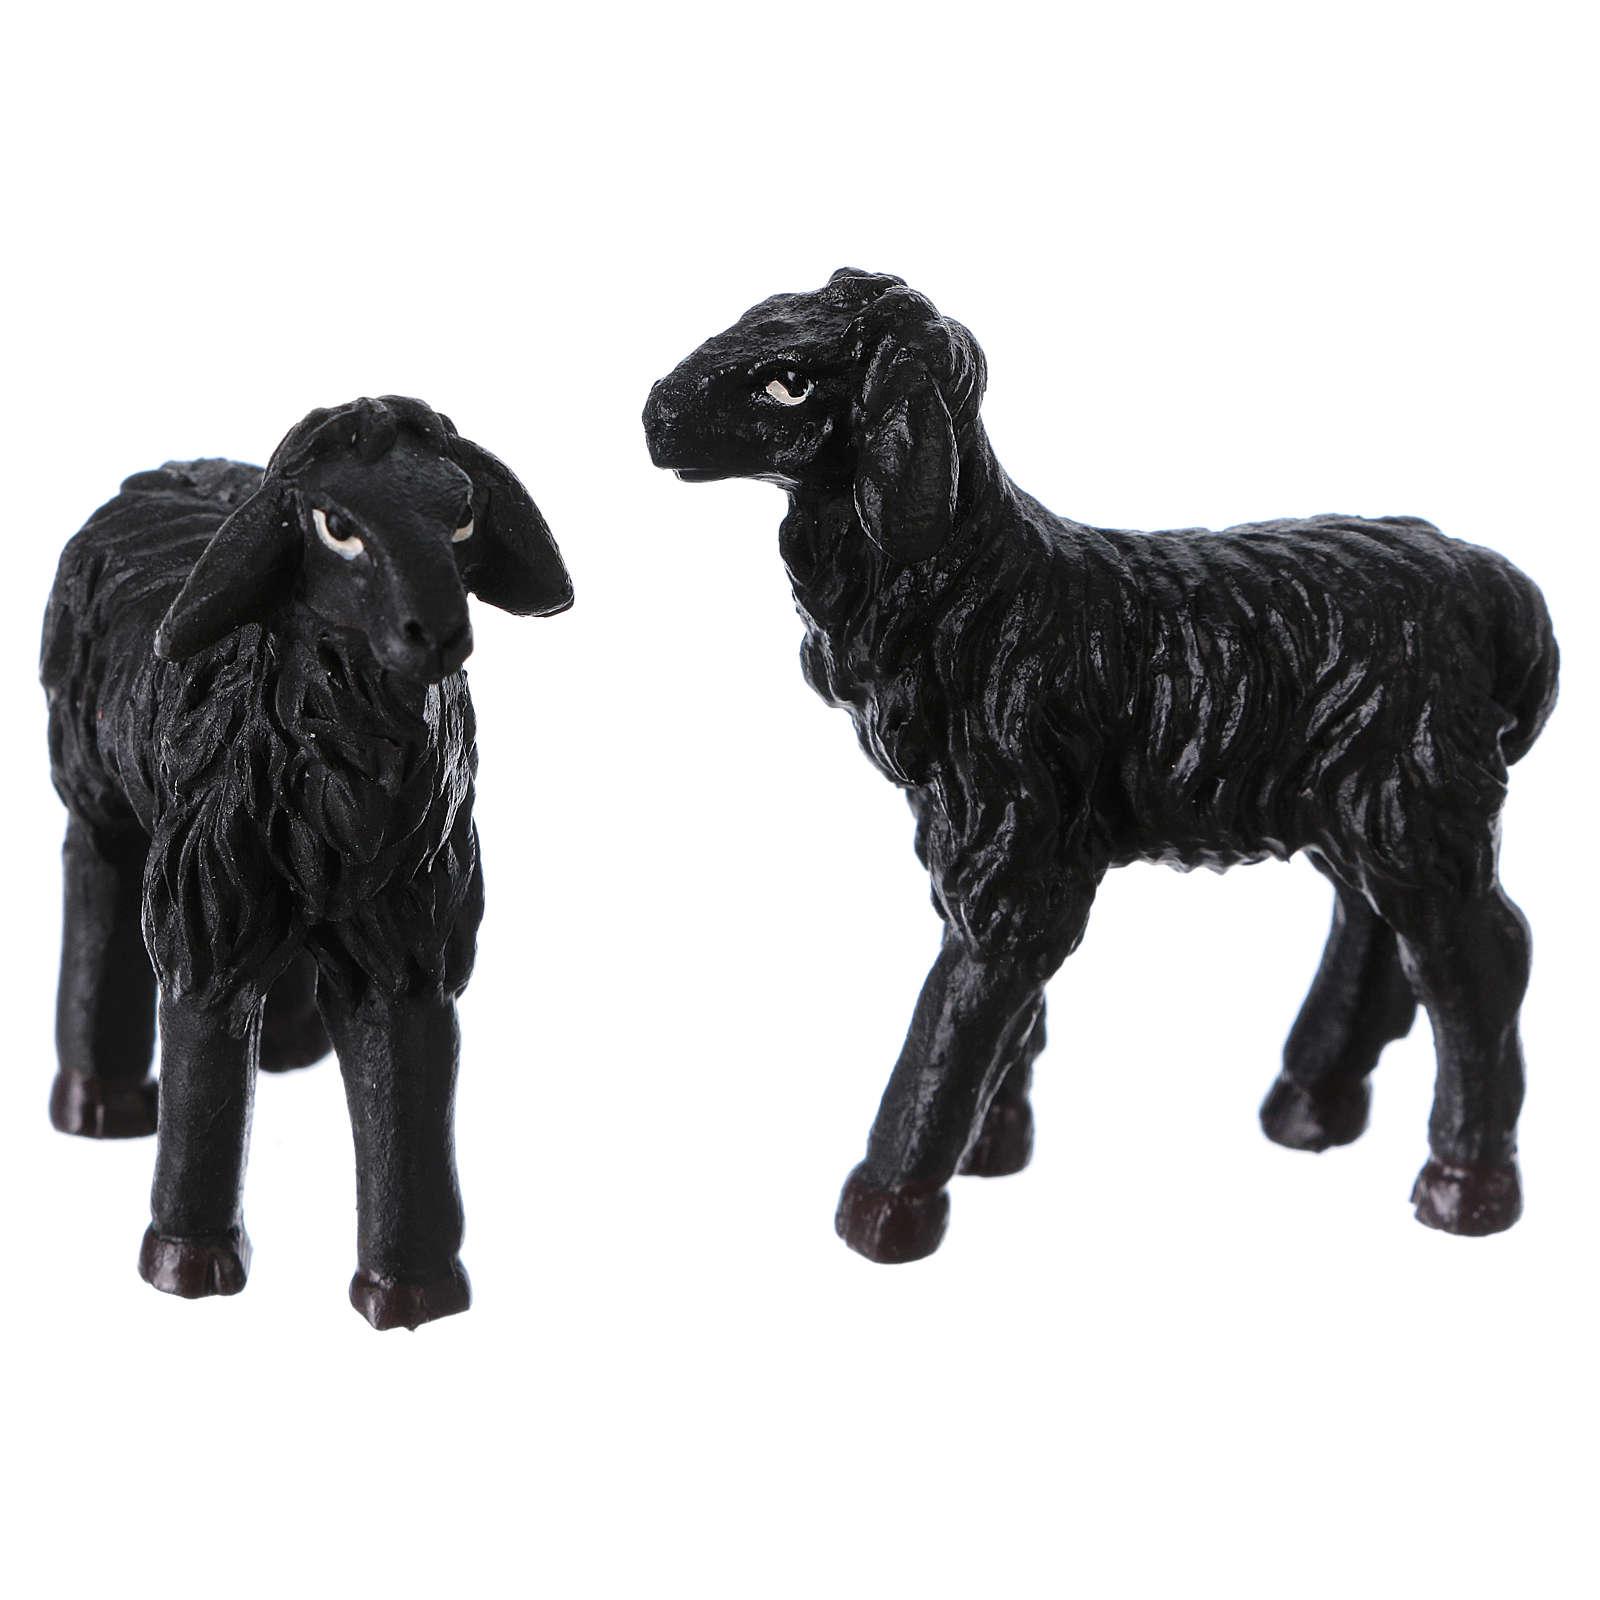 Black sheep 2 pieces for 9cm Nativity Scenes 3